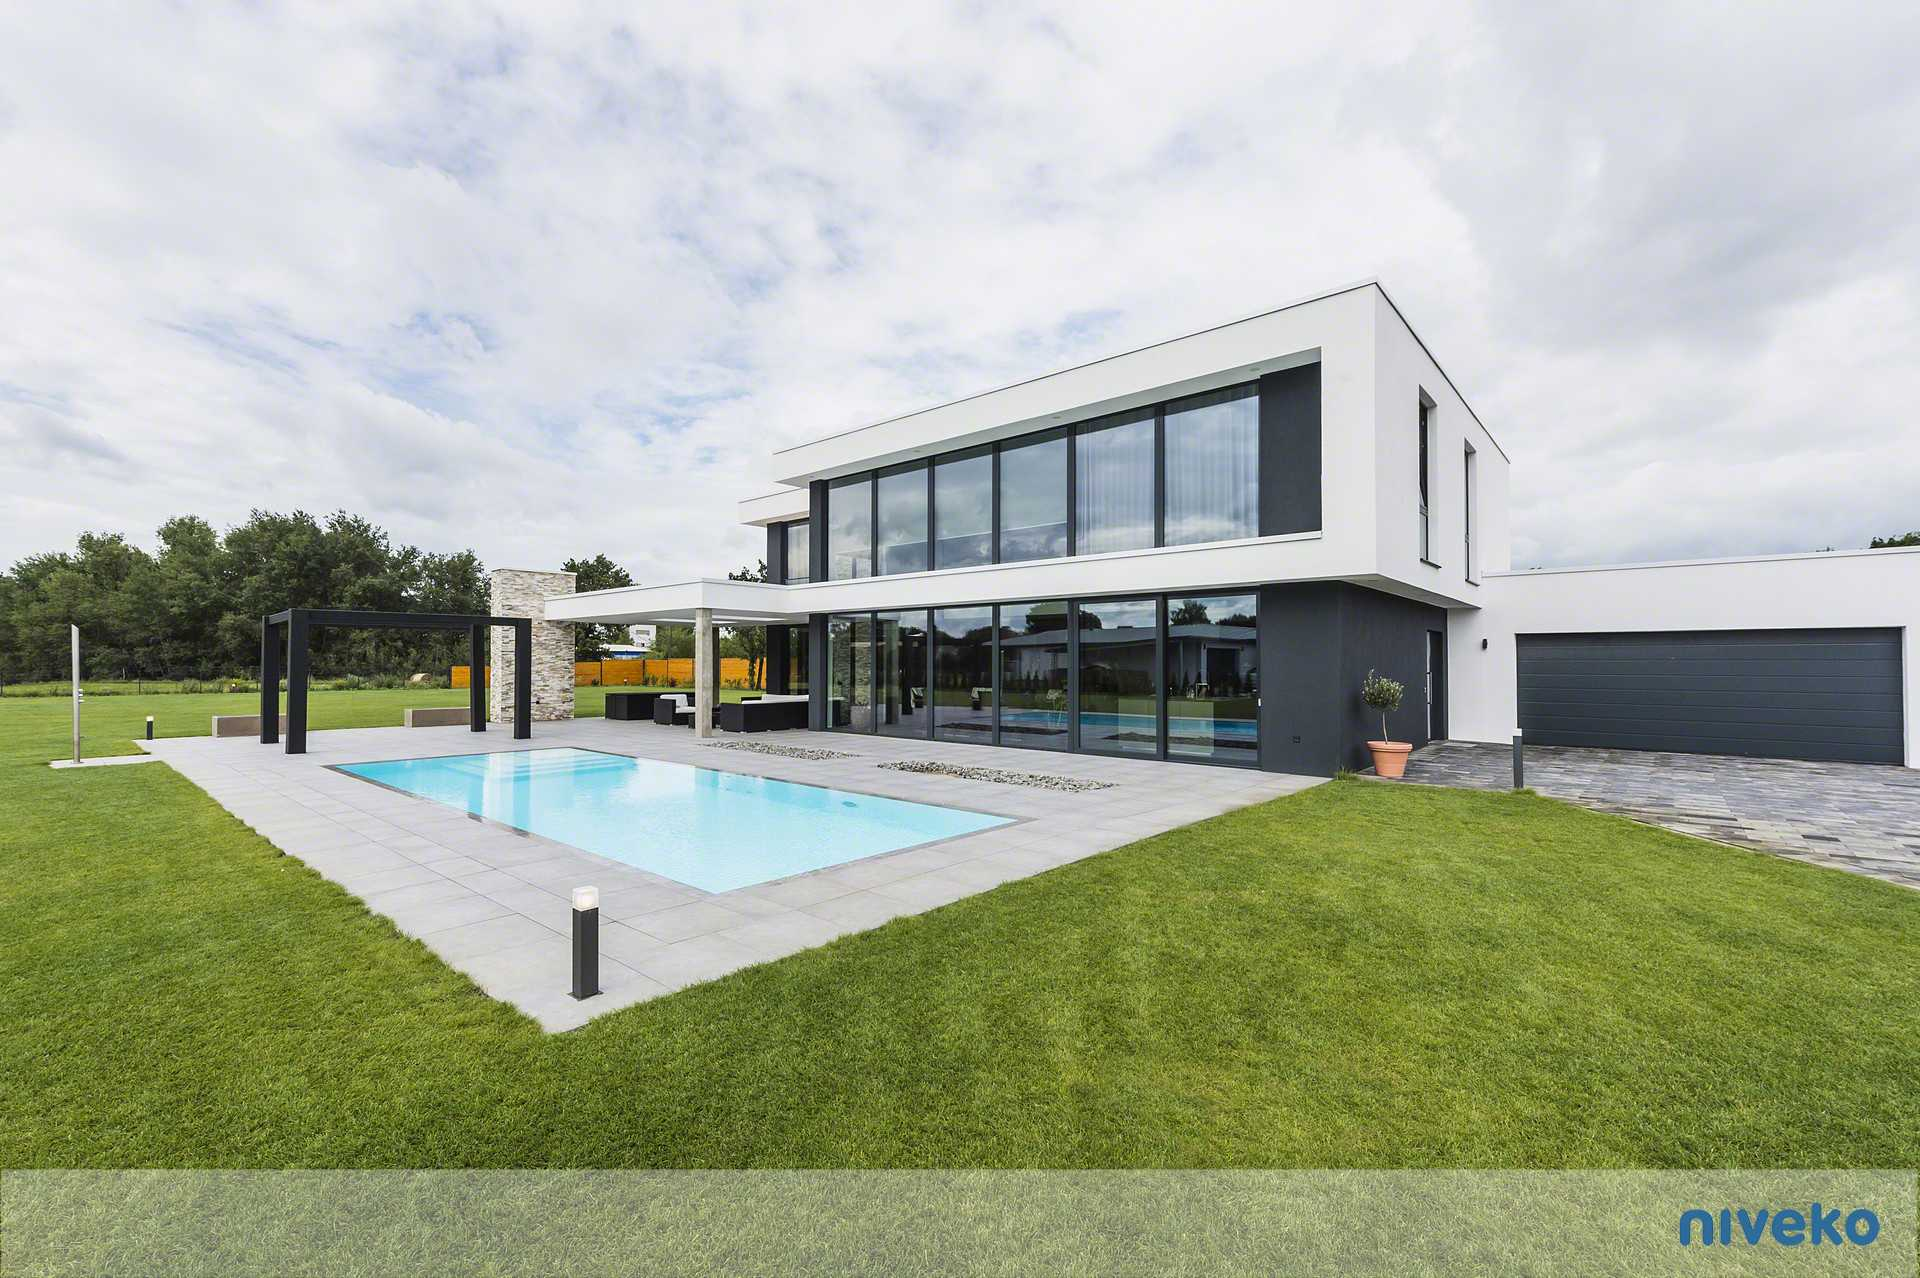 Niveko Advance Pool - Saurwein Schwimmbad Technik